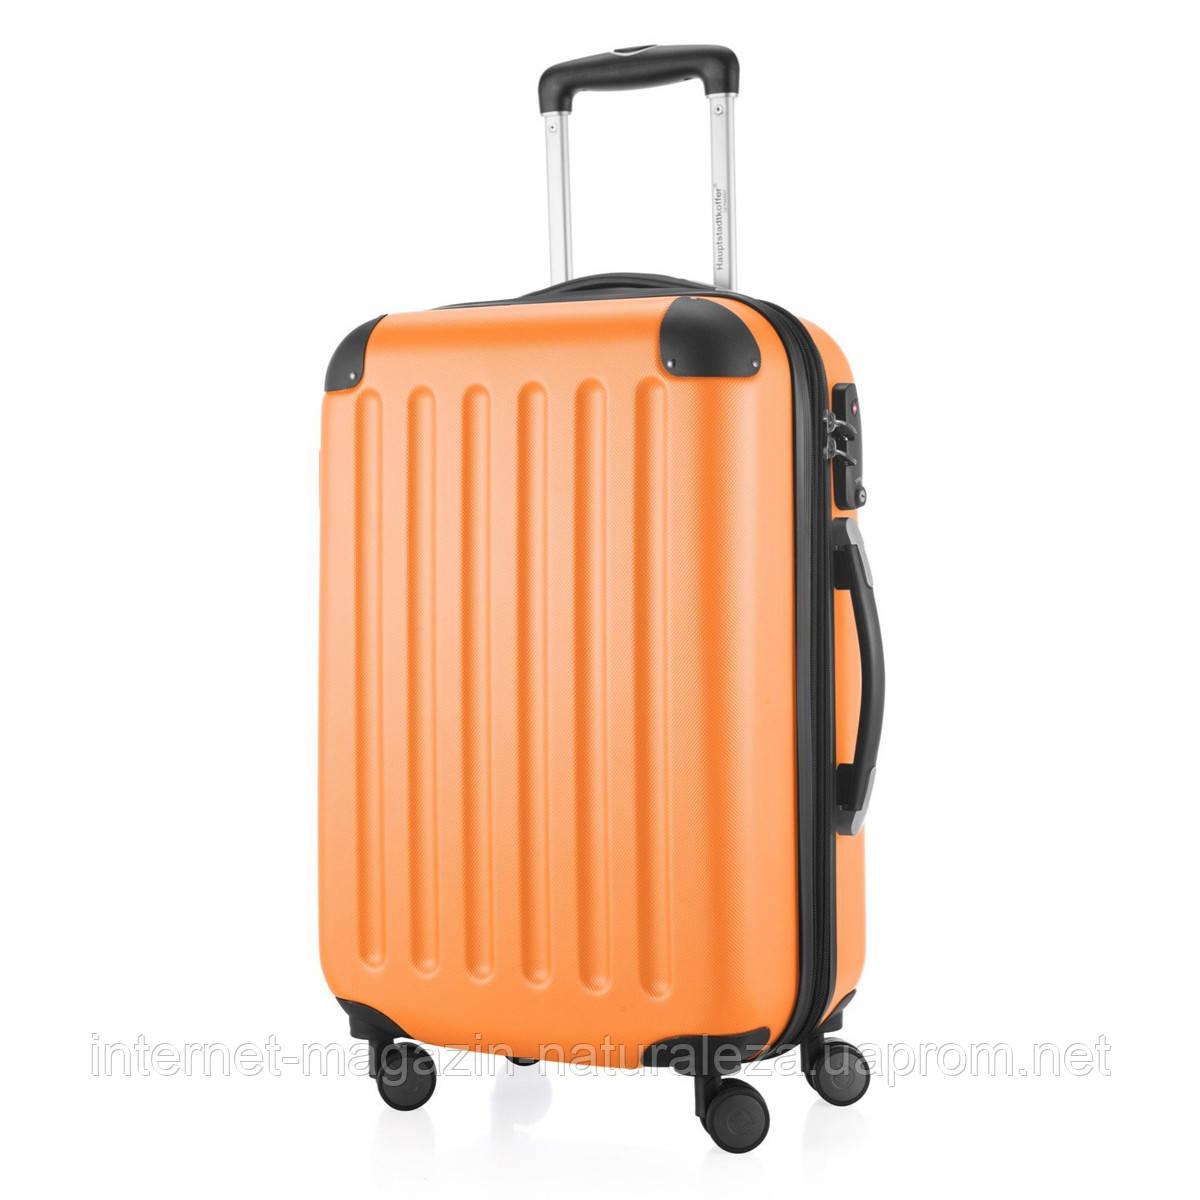 Чемоданы Hauptstadtkoffer Spree Mini оранжевый